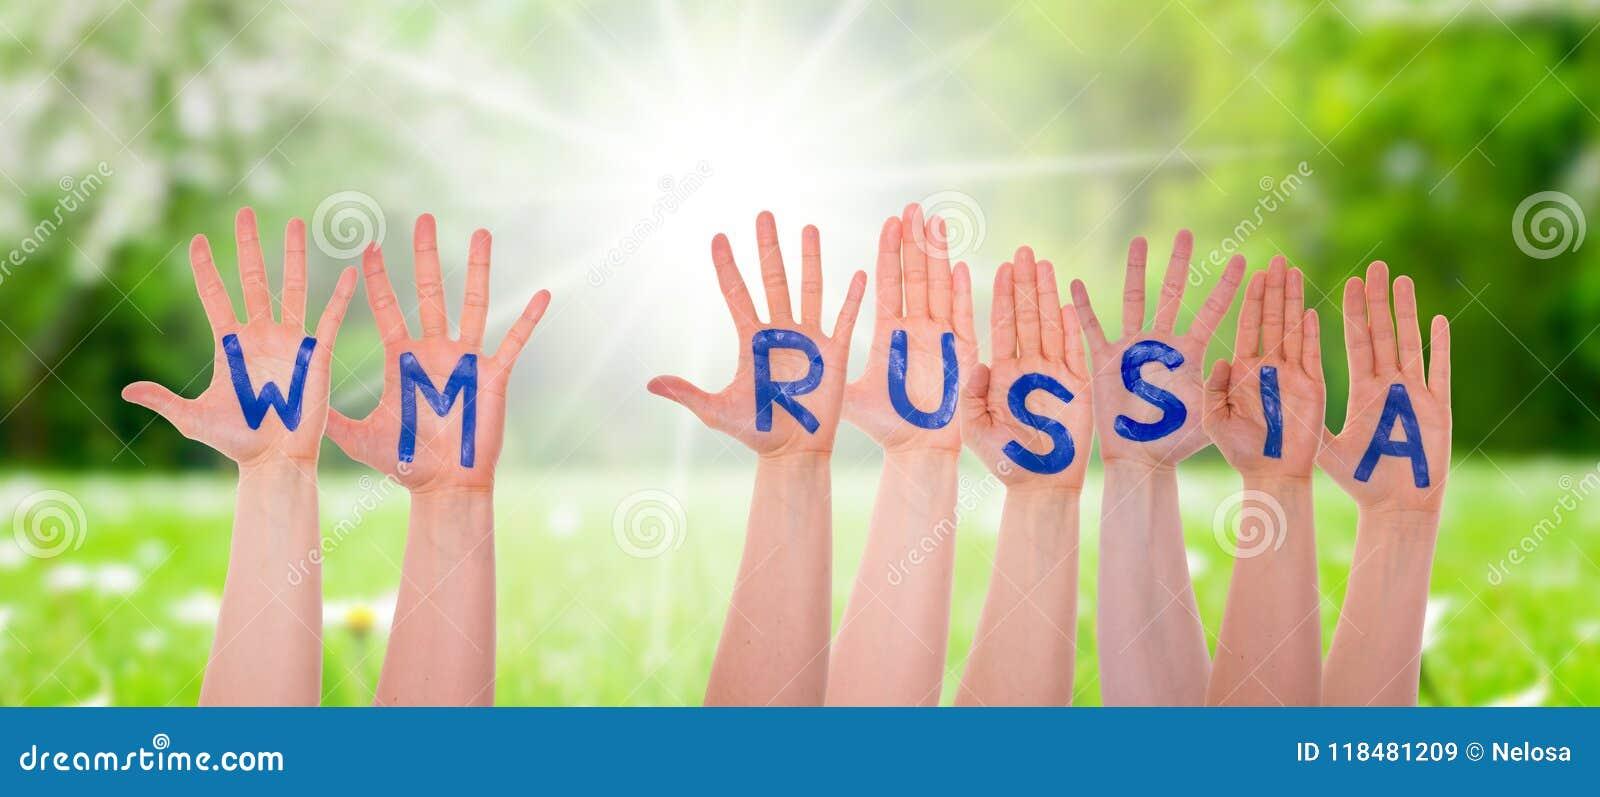 Russia Wm